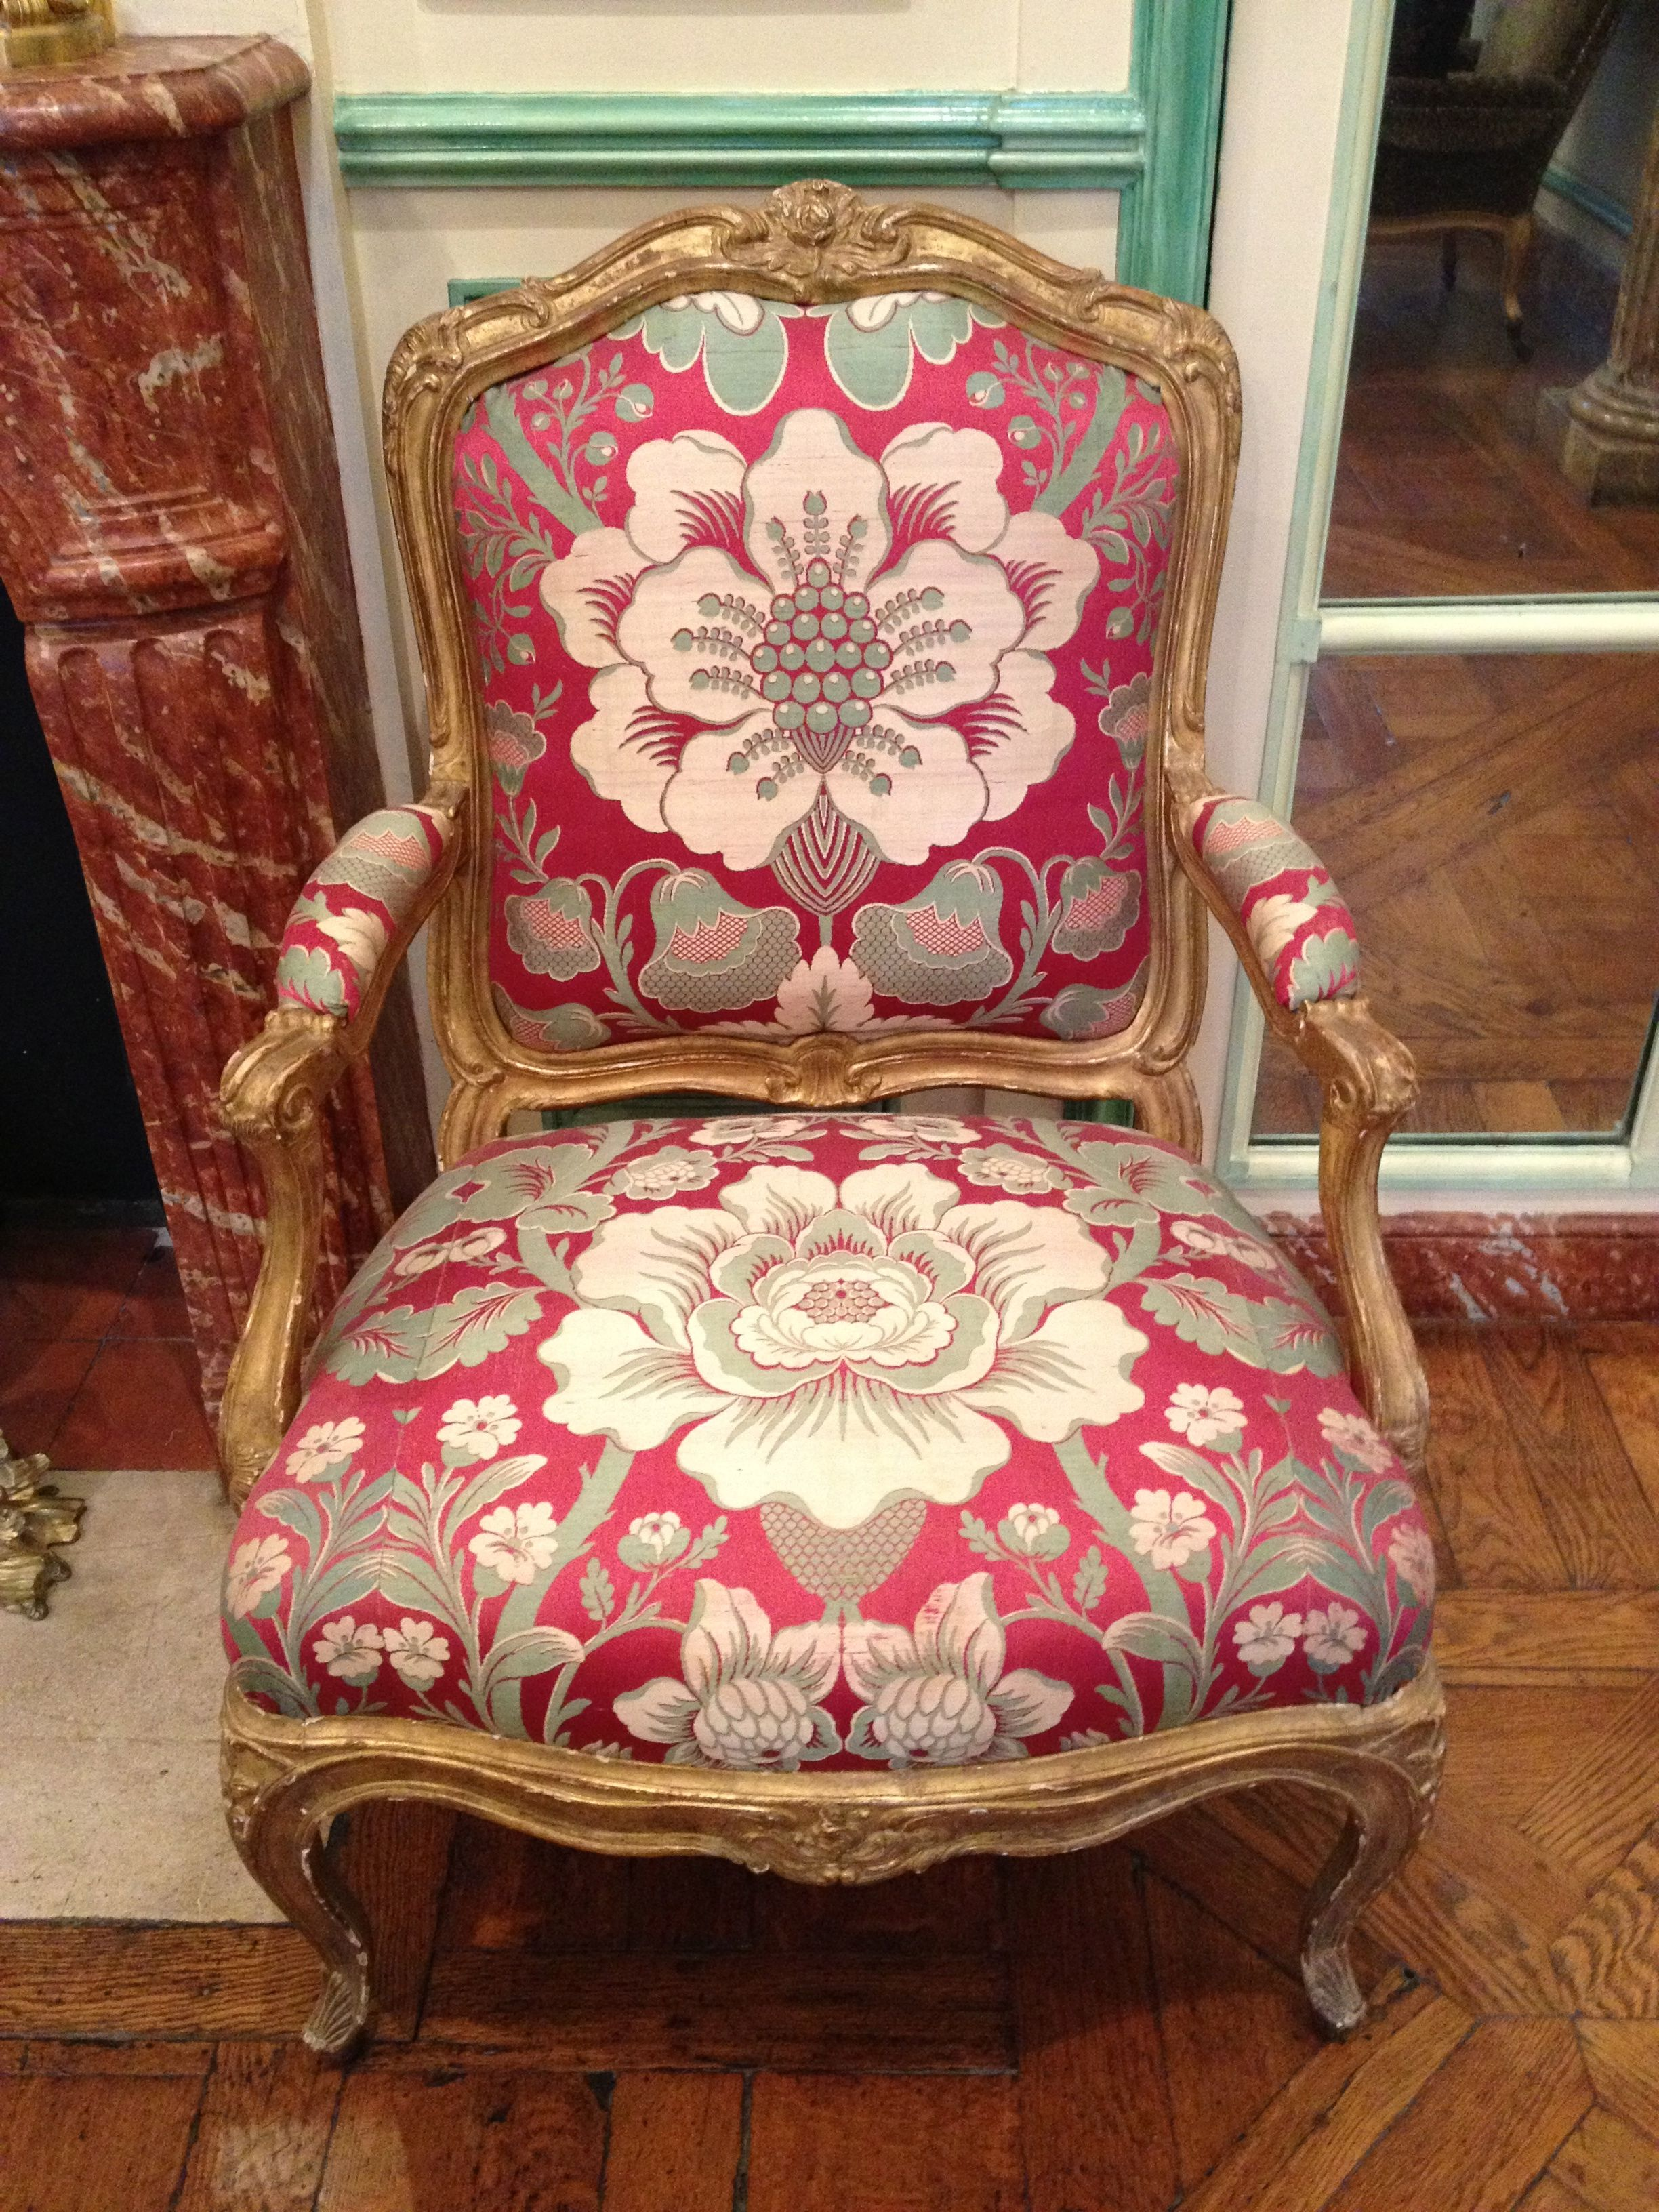 Louis XV Chair at Musée Carnavalet Paris